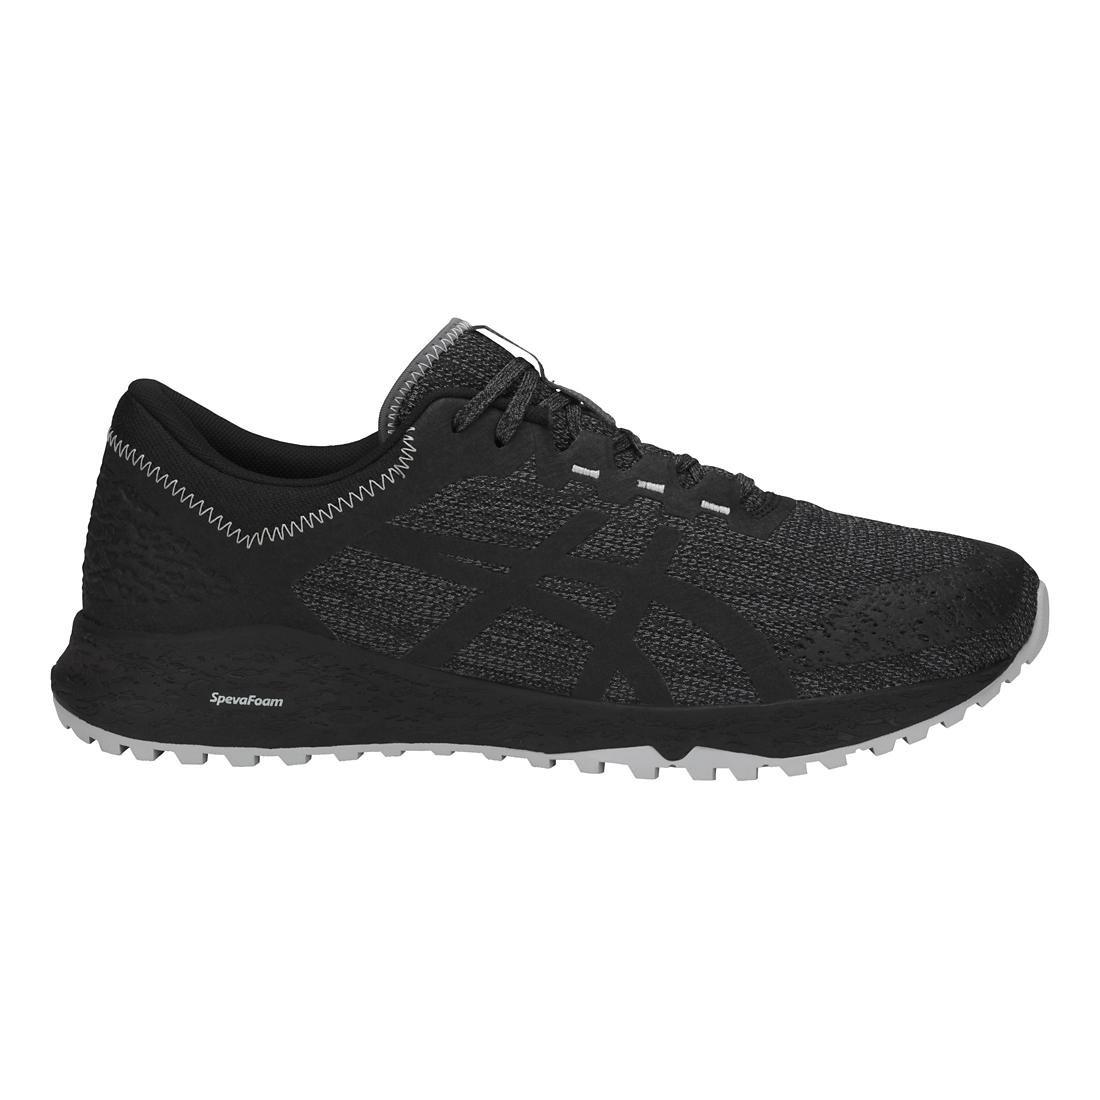 ASICS Mens Alpine XT Running Shoe B0719KQ8TD 8 D US|CARBON - 9716